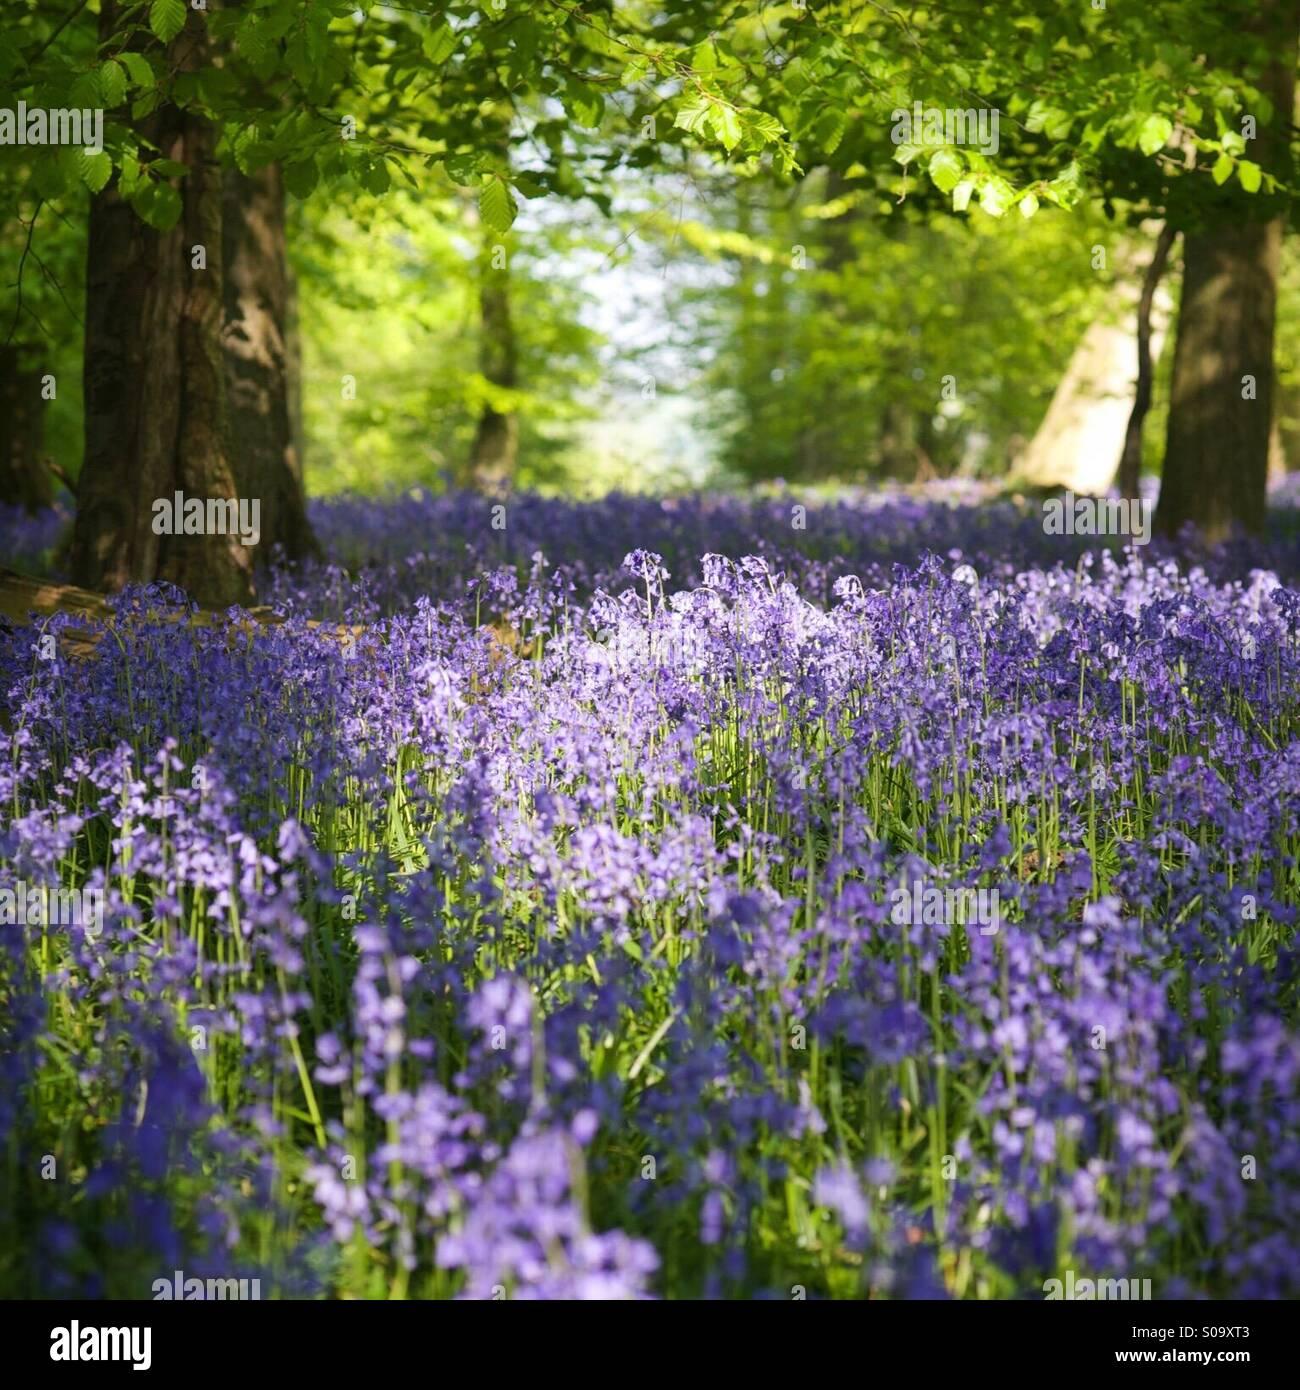 Bluebell woods, Oxfordshire, England. - Stock Image